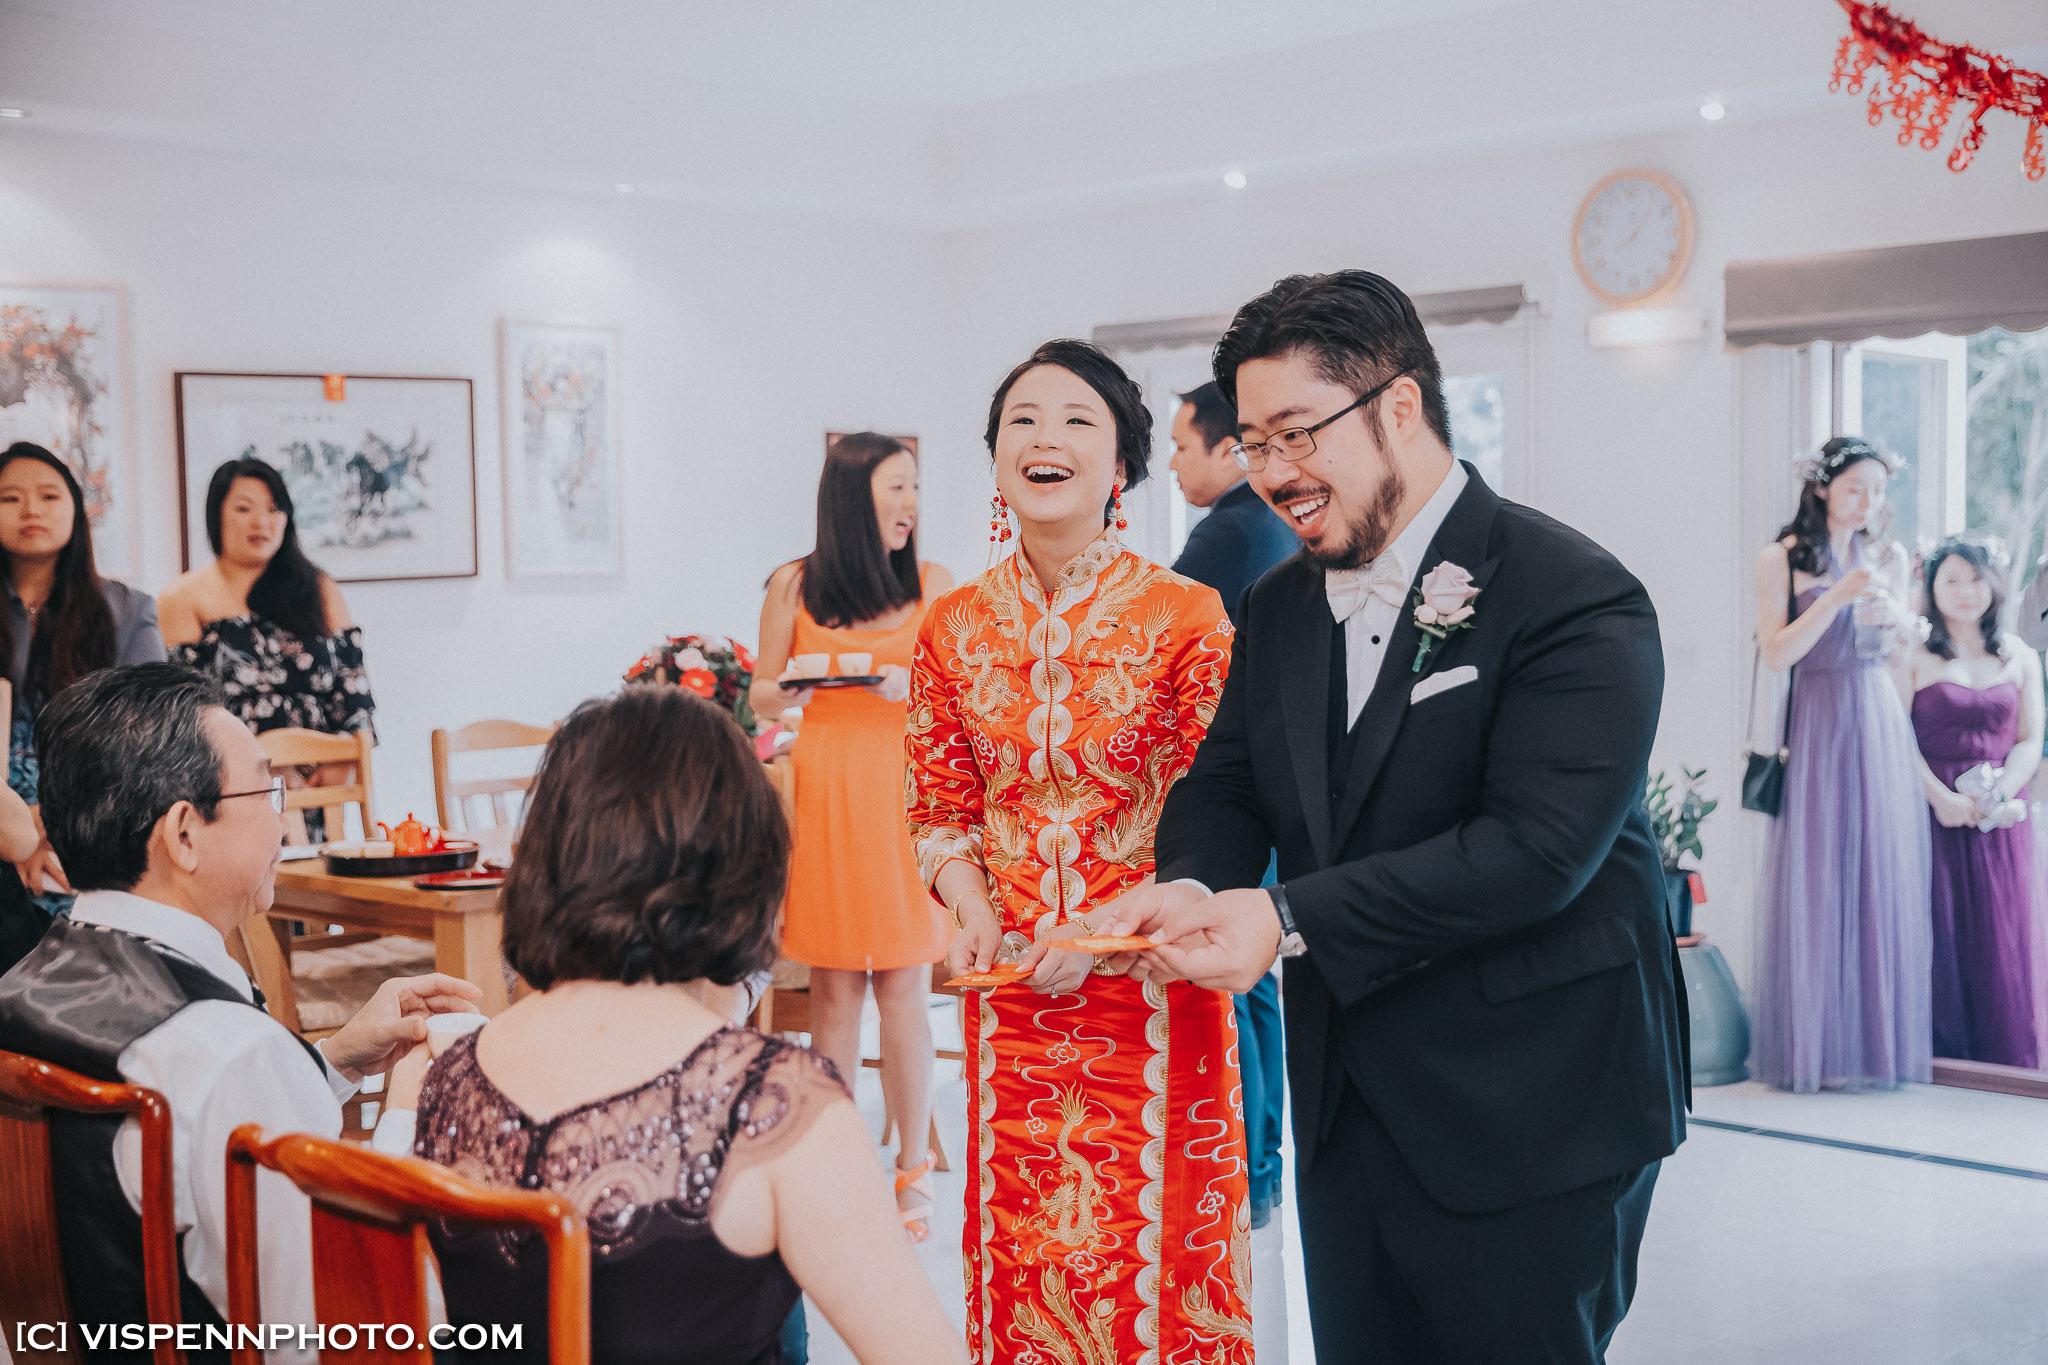 WEDDING DAY Photography Melbourne VISPENN 墨尔本 婚礼跟拍 婚礼摄像 婚礼摄影 结婚照 登记照 1DX 2018